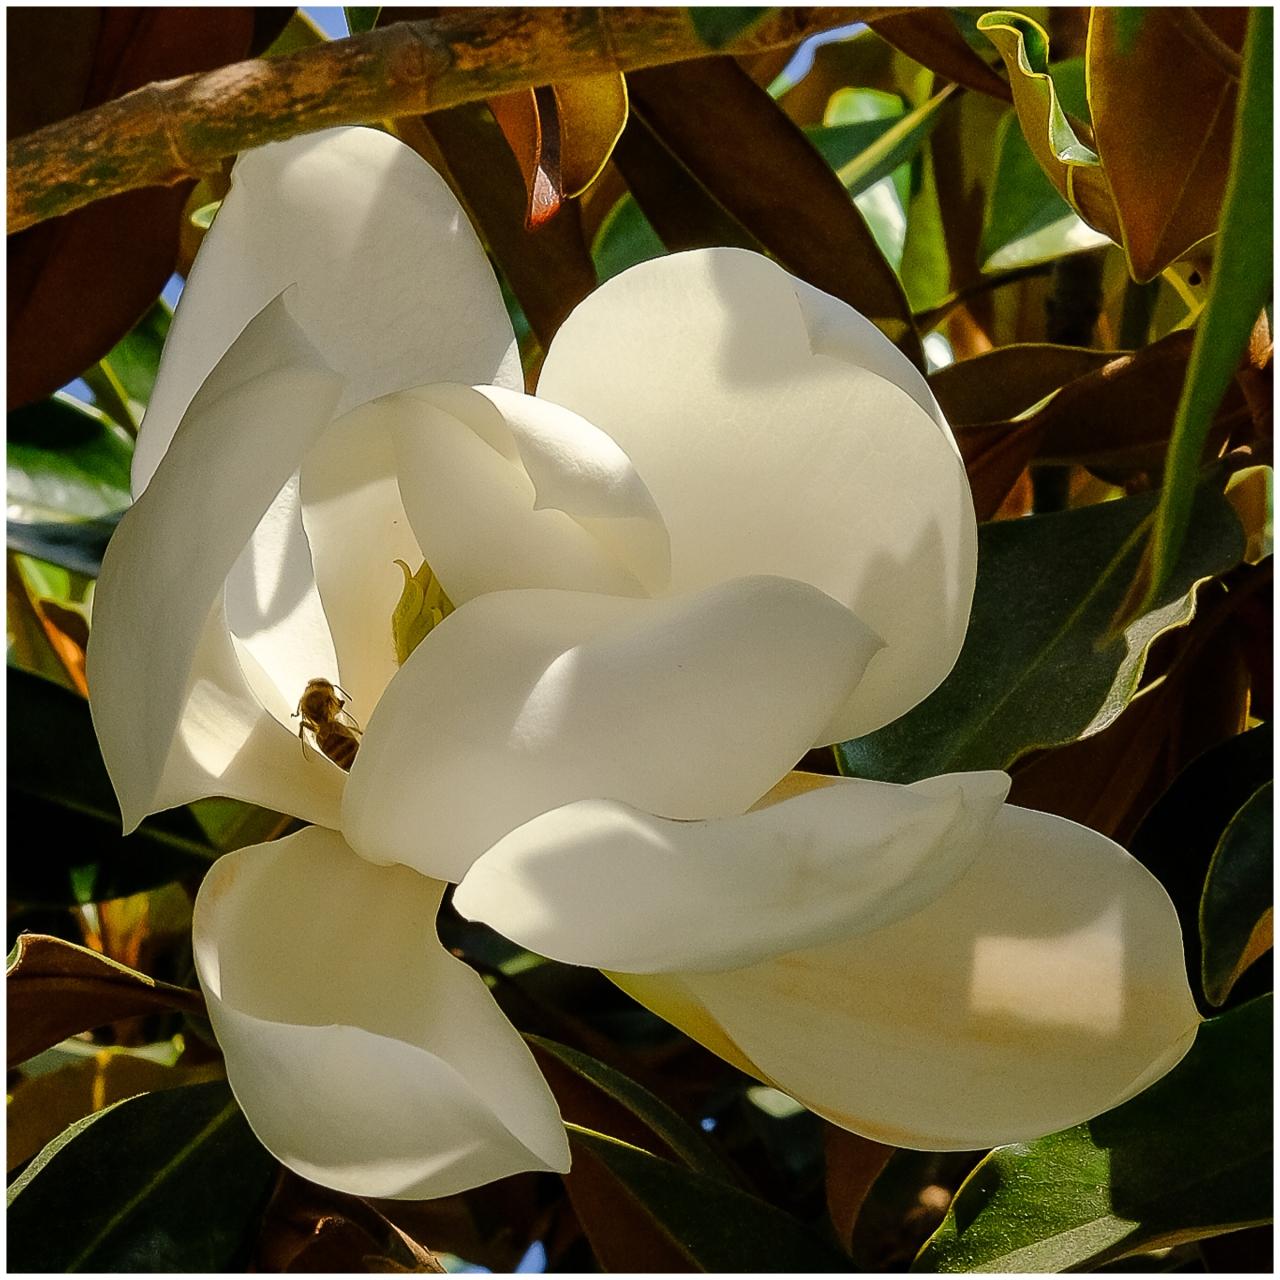 Magnolia and abee